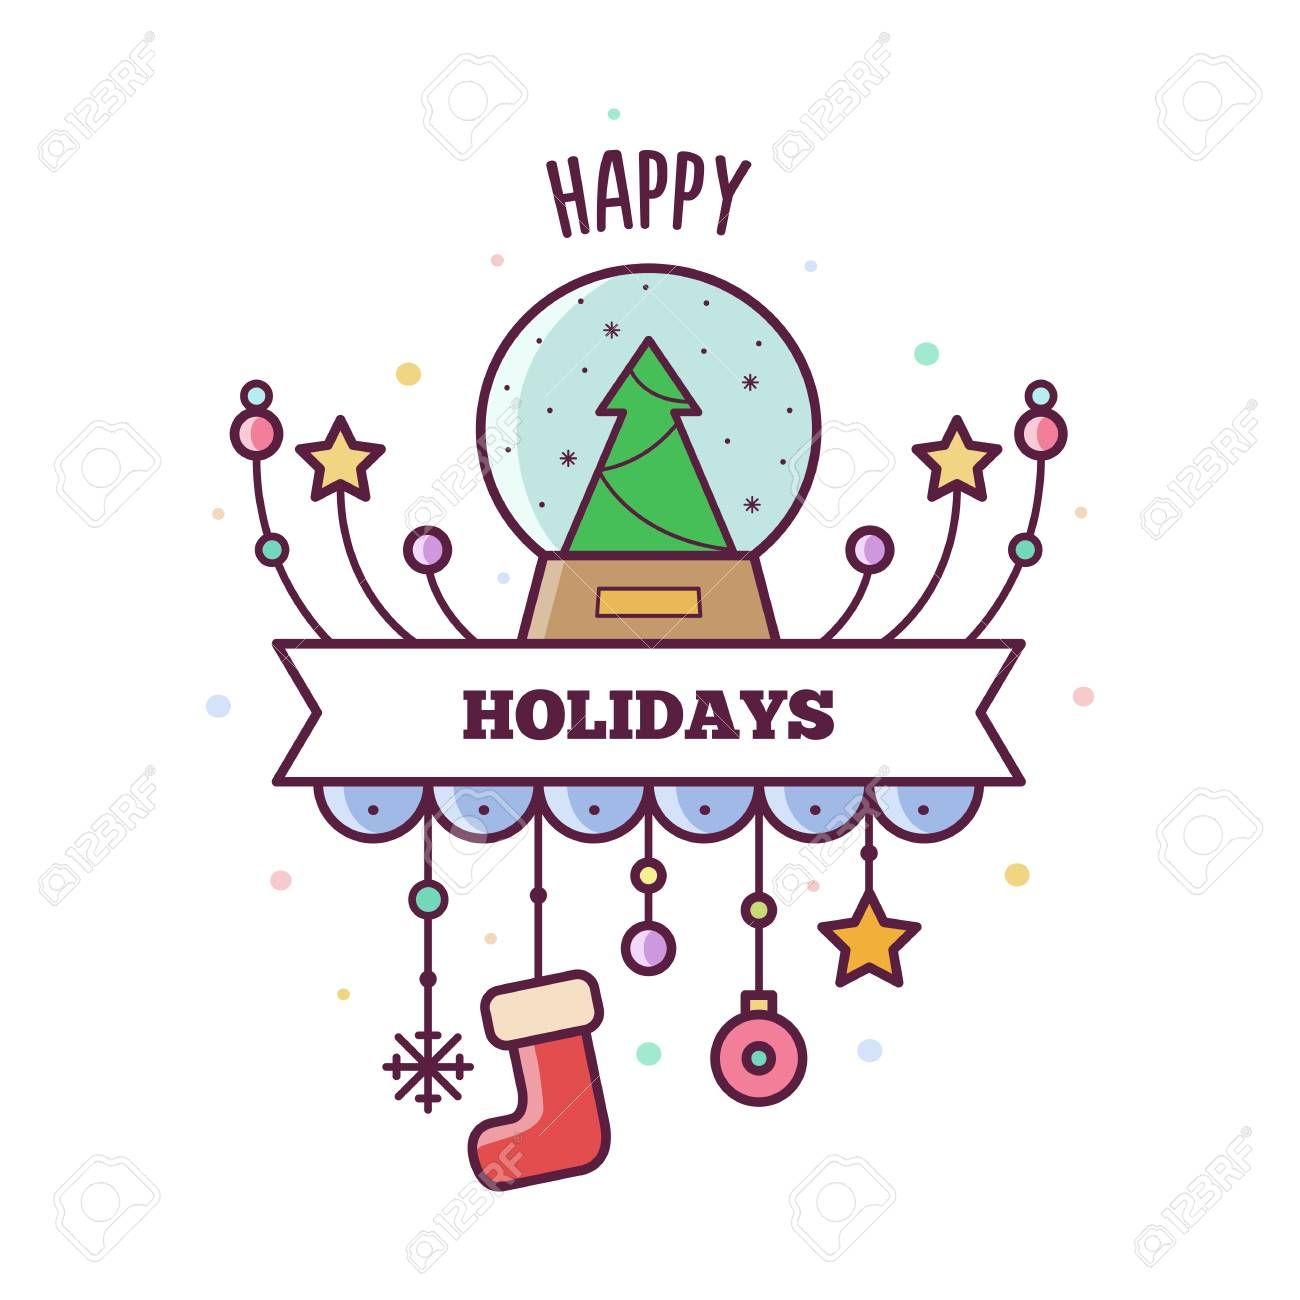 Happy Holidays Vector Illustration Affiliate Holidays Happy Illustration Vector Birthday Card Drawing Christmas Journal Bullet Journal Doodles